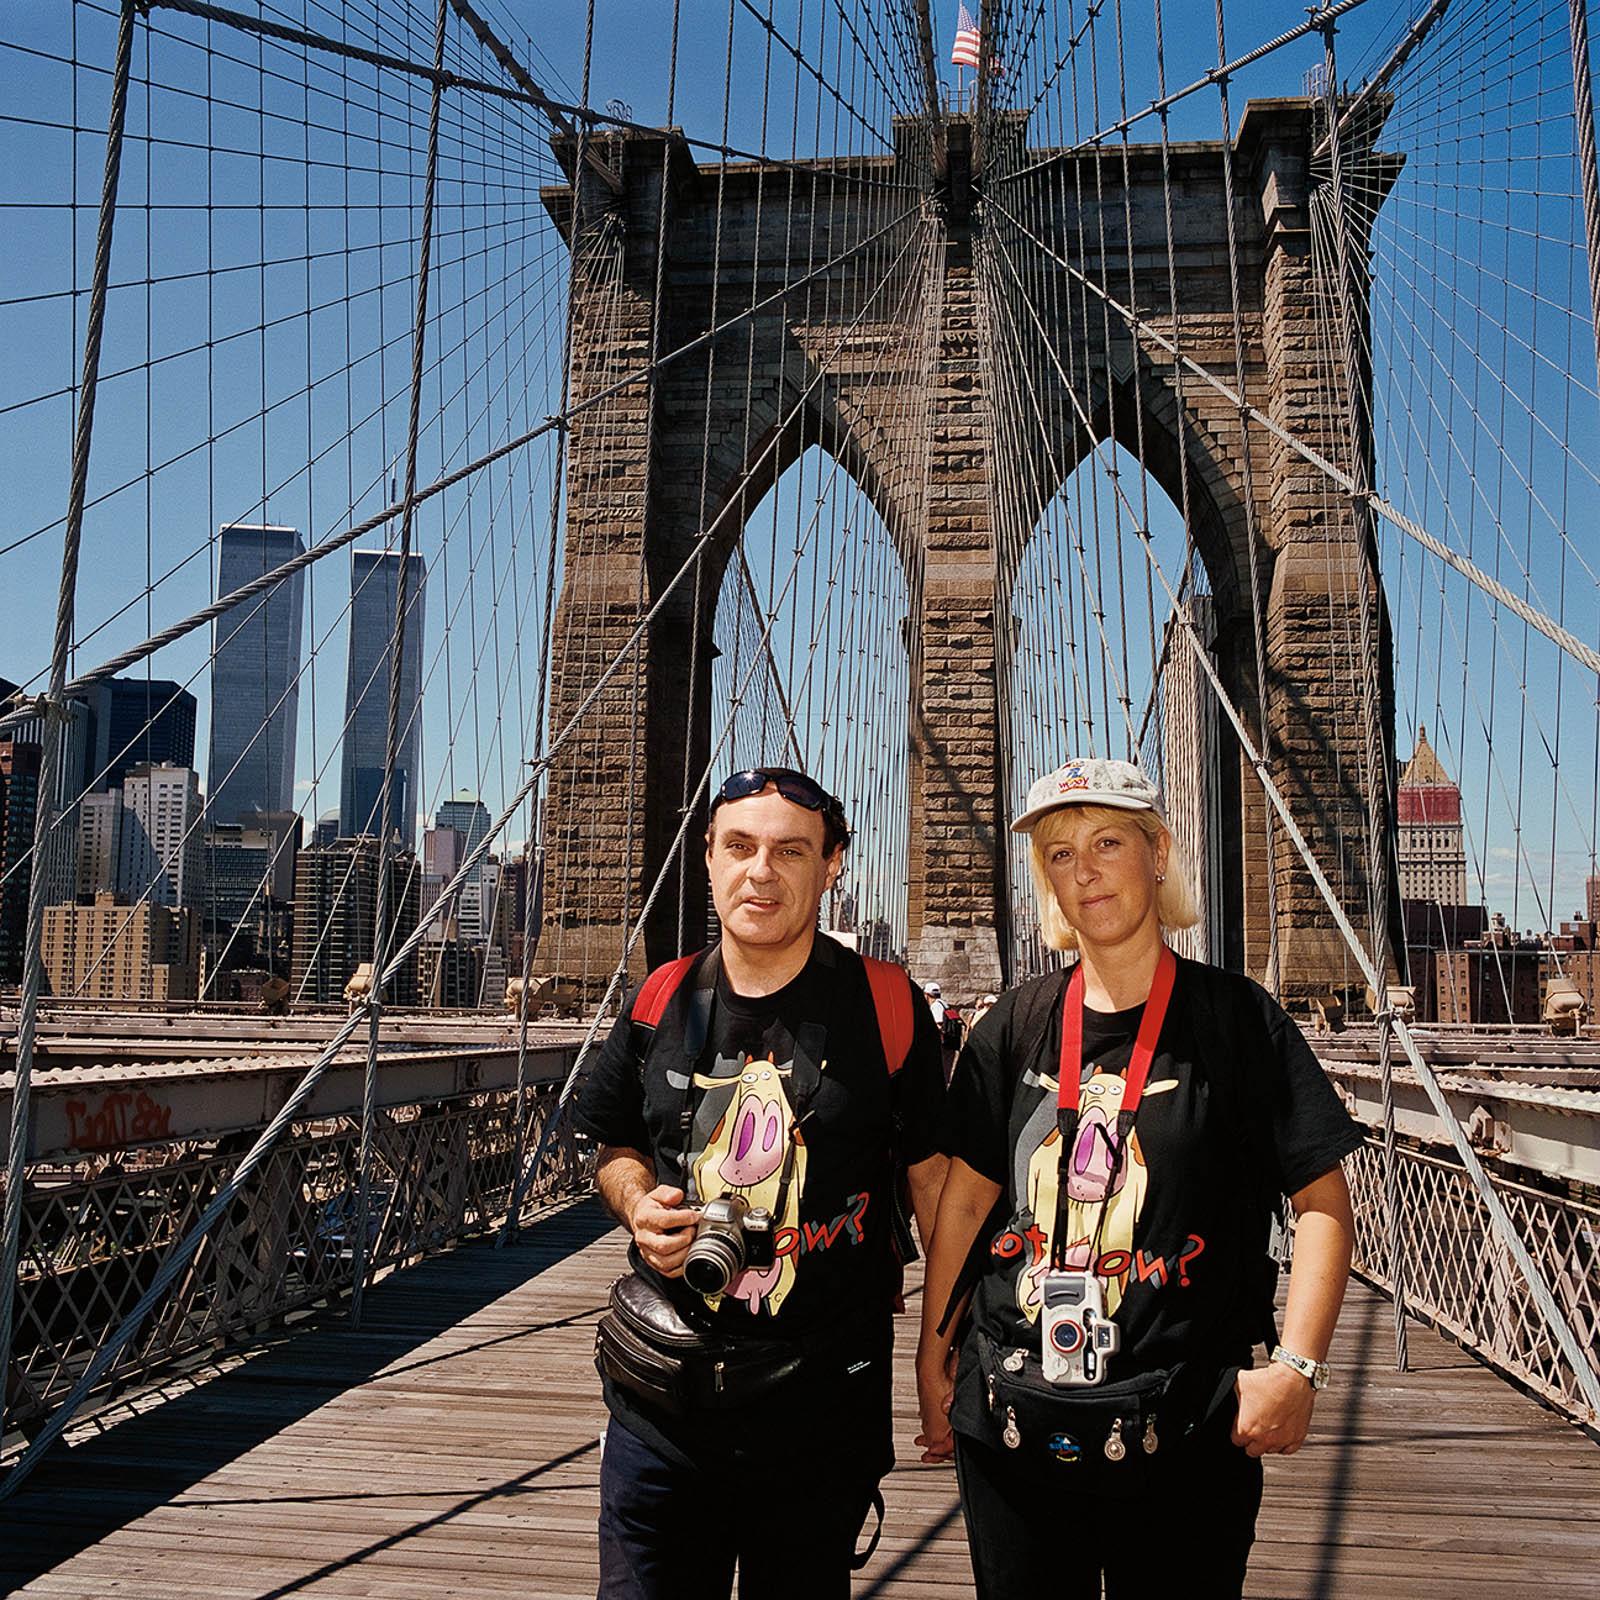 Couple at Brooklyn Bridge, New York City 2000